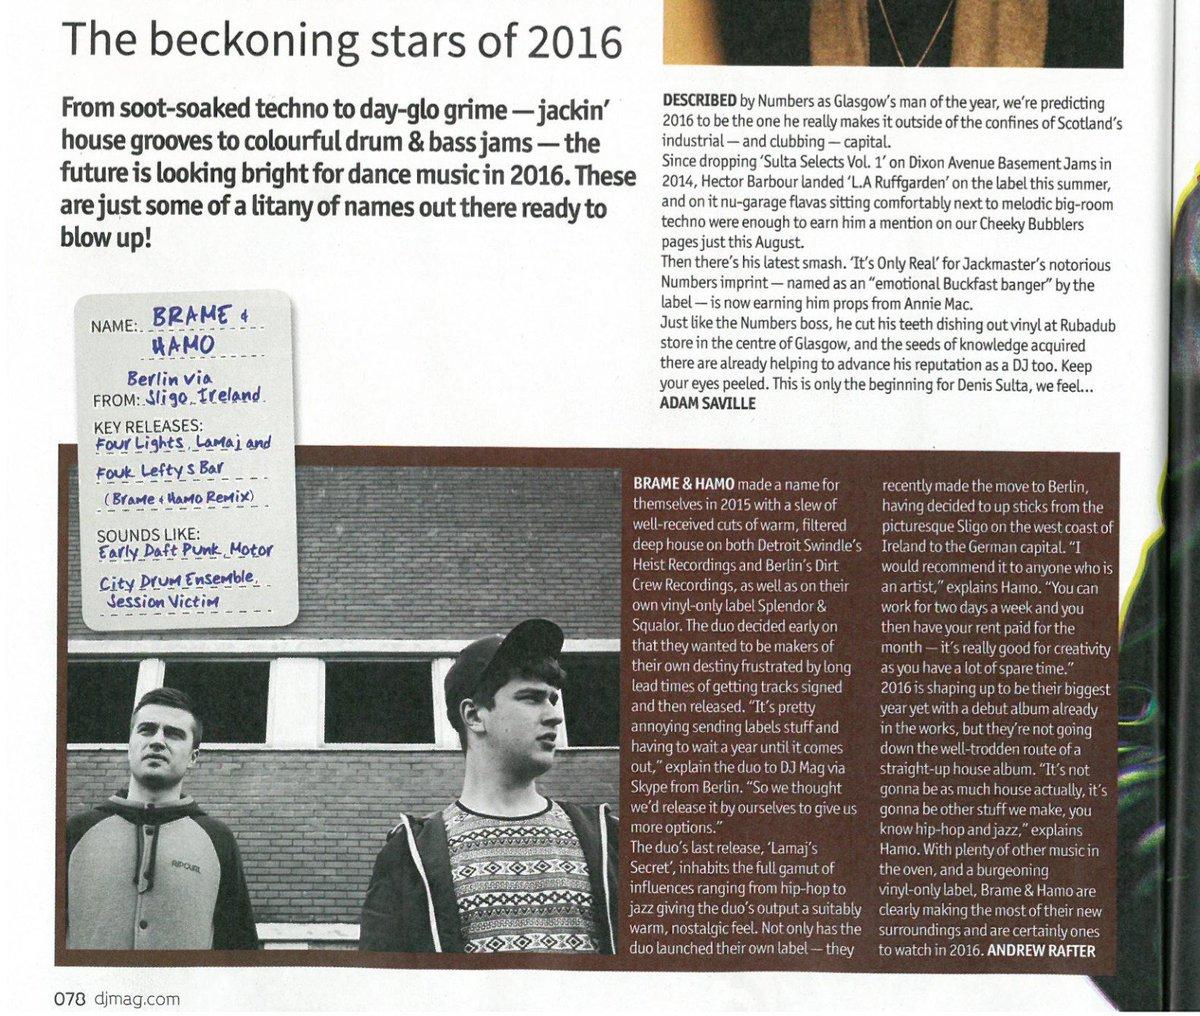 "Proud of our #sligo boys @BrameHamo making it into @DJMag's ""ONES TO WATCH OUT FOR 2016"" -> https://t.co/xXXdrUXoJS https://t.co/AjlITNSvyl"